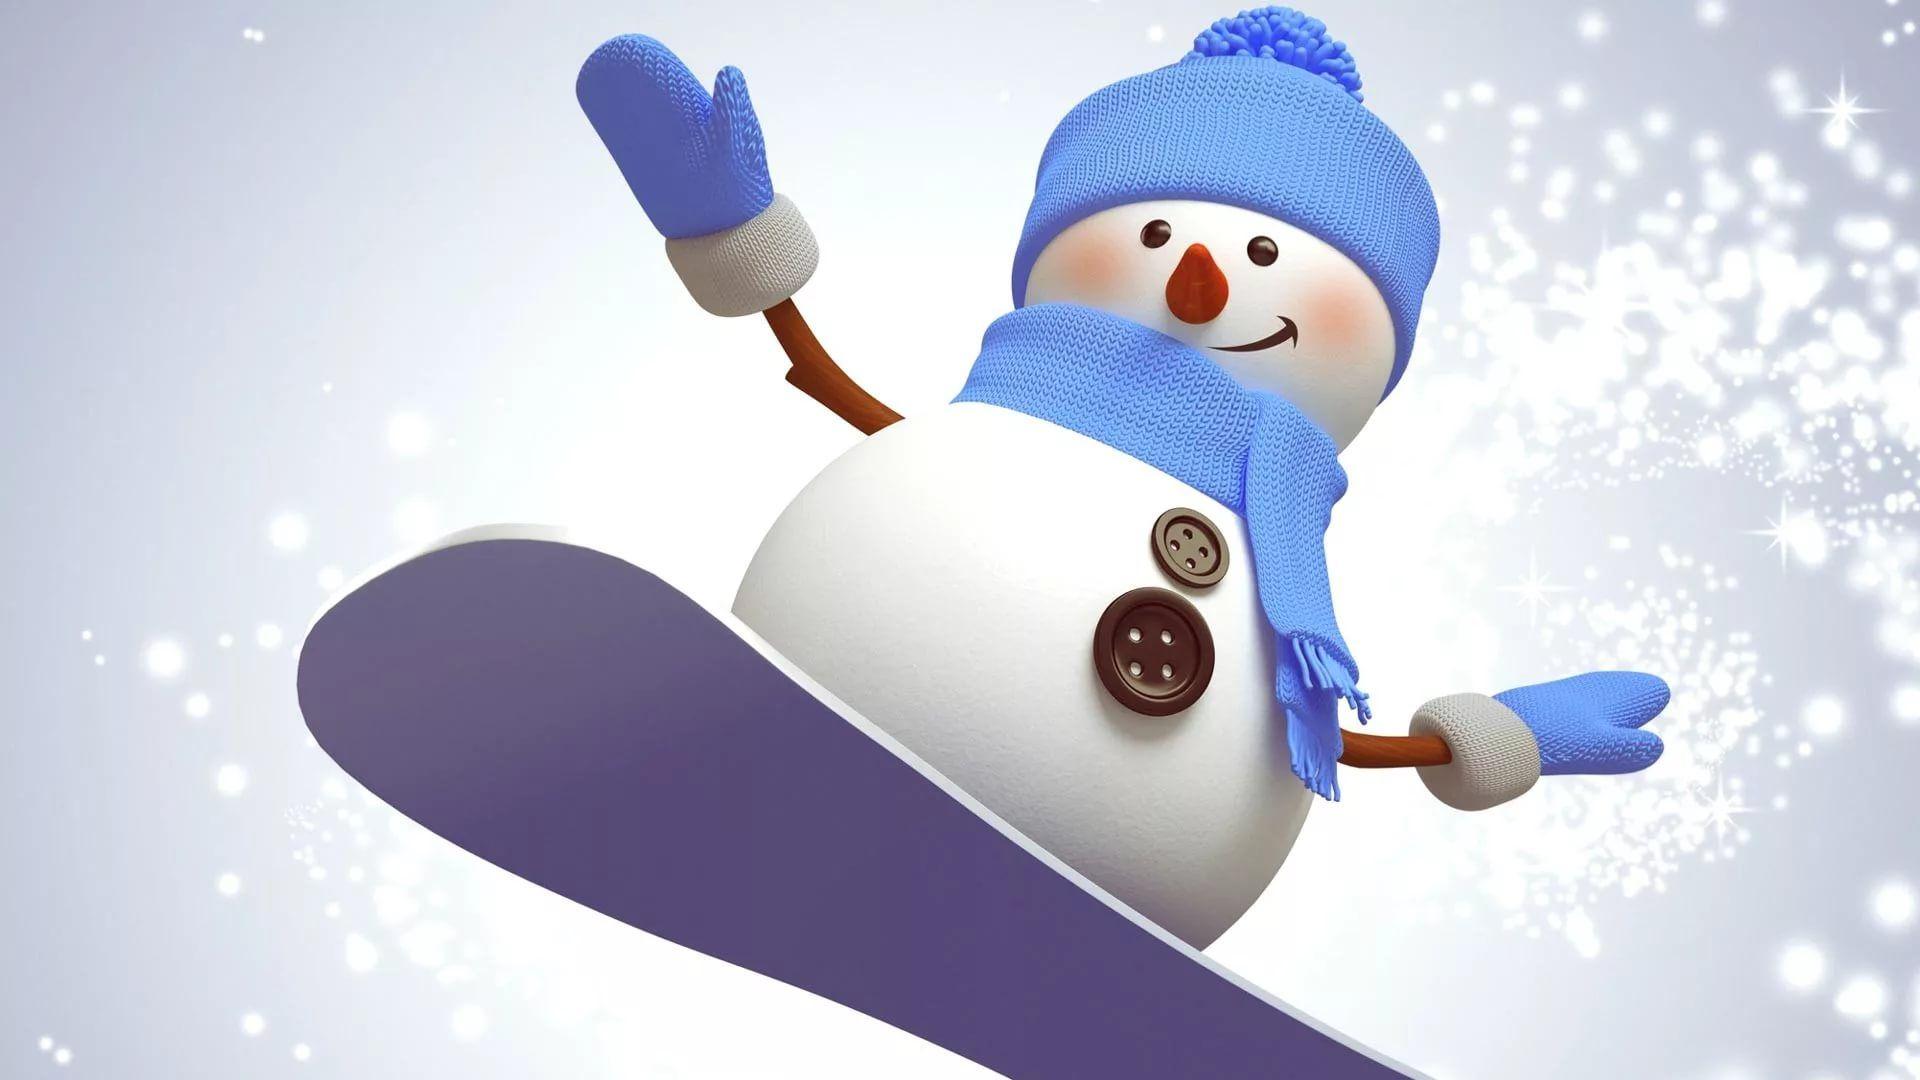 Cute Winter Cool HD Wallpaper